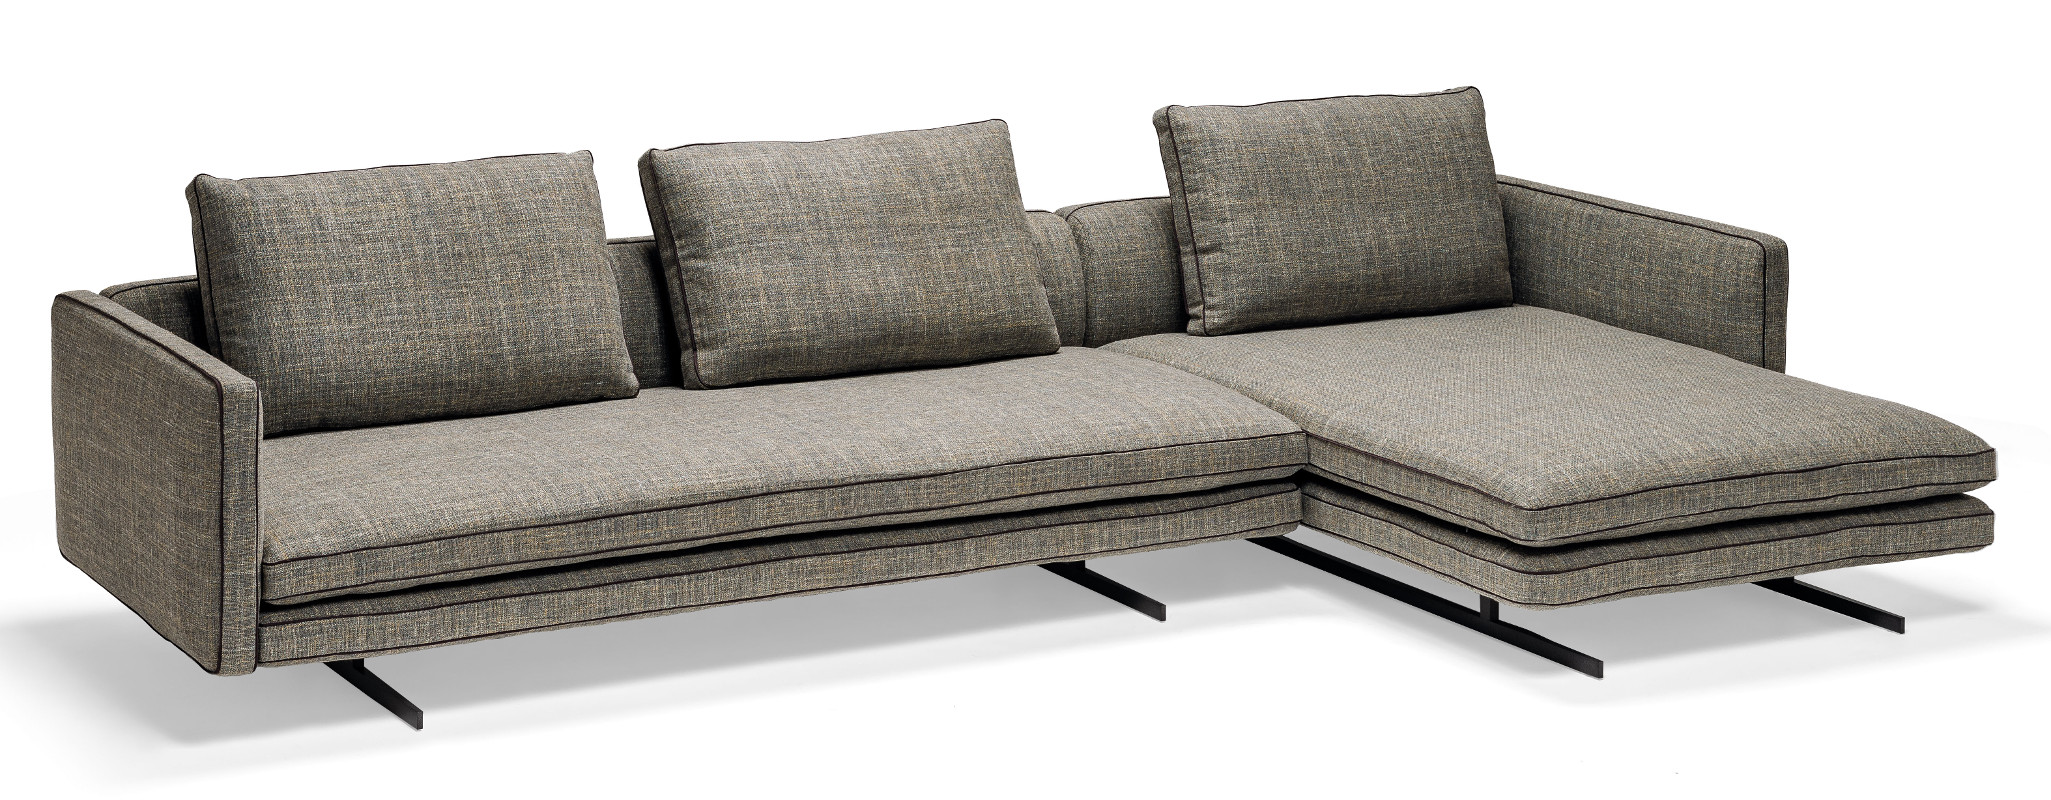 moss-sofa-design-arketipo